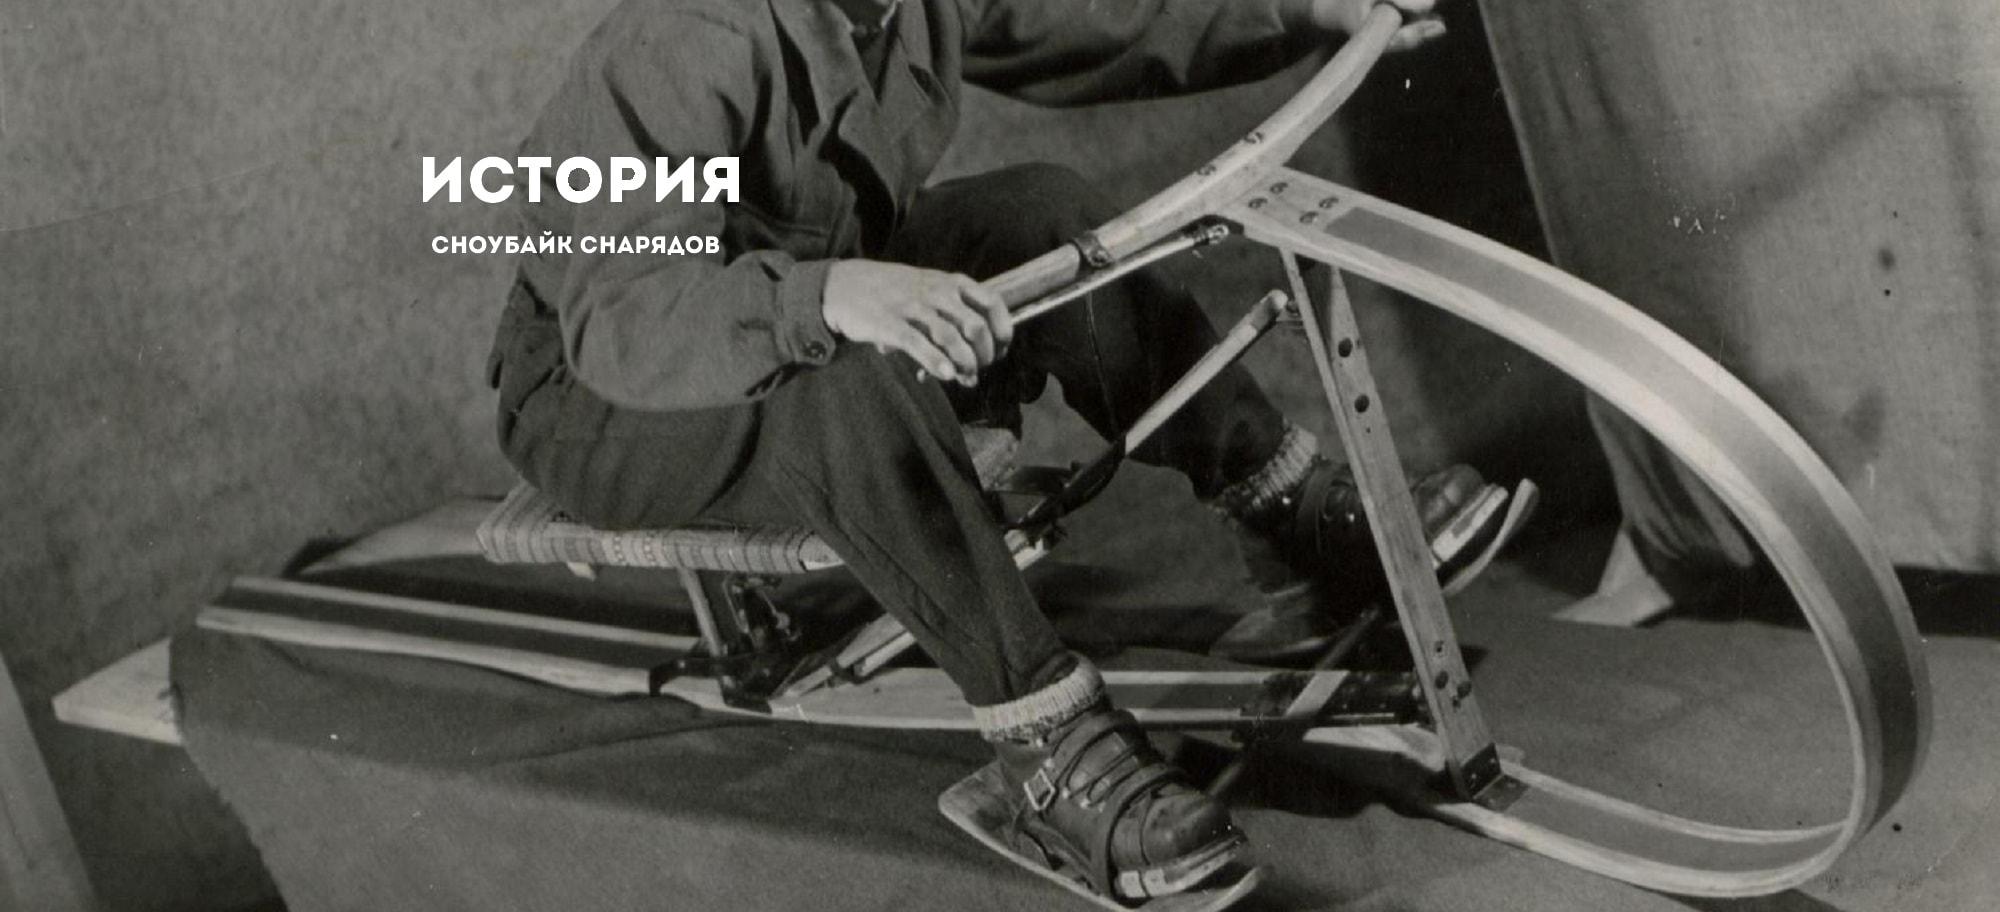 Snowbike-history_2-min